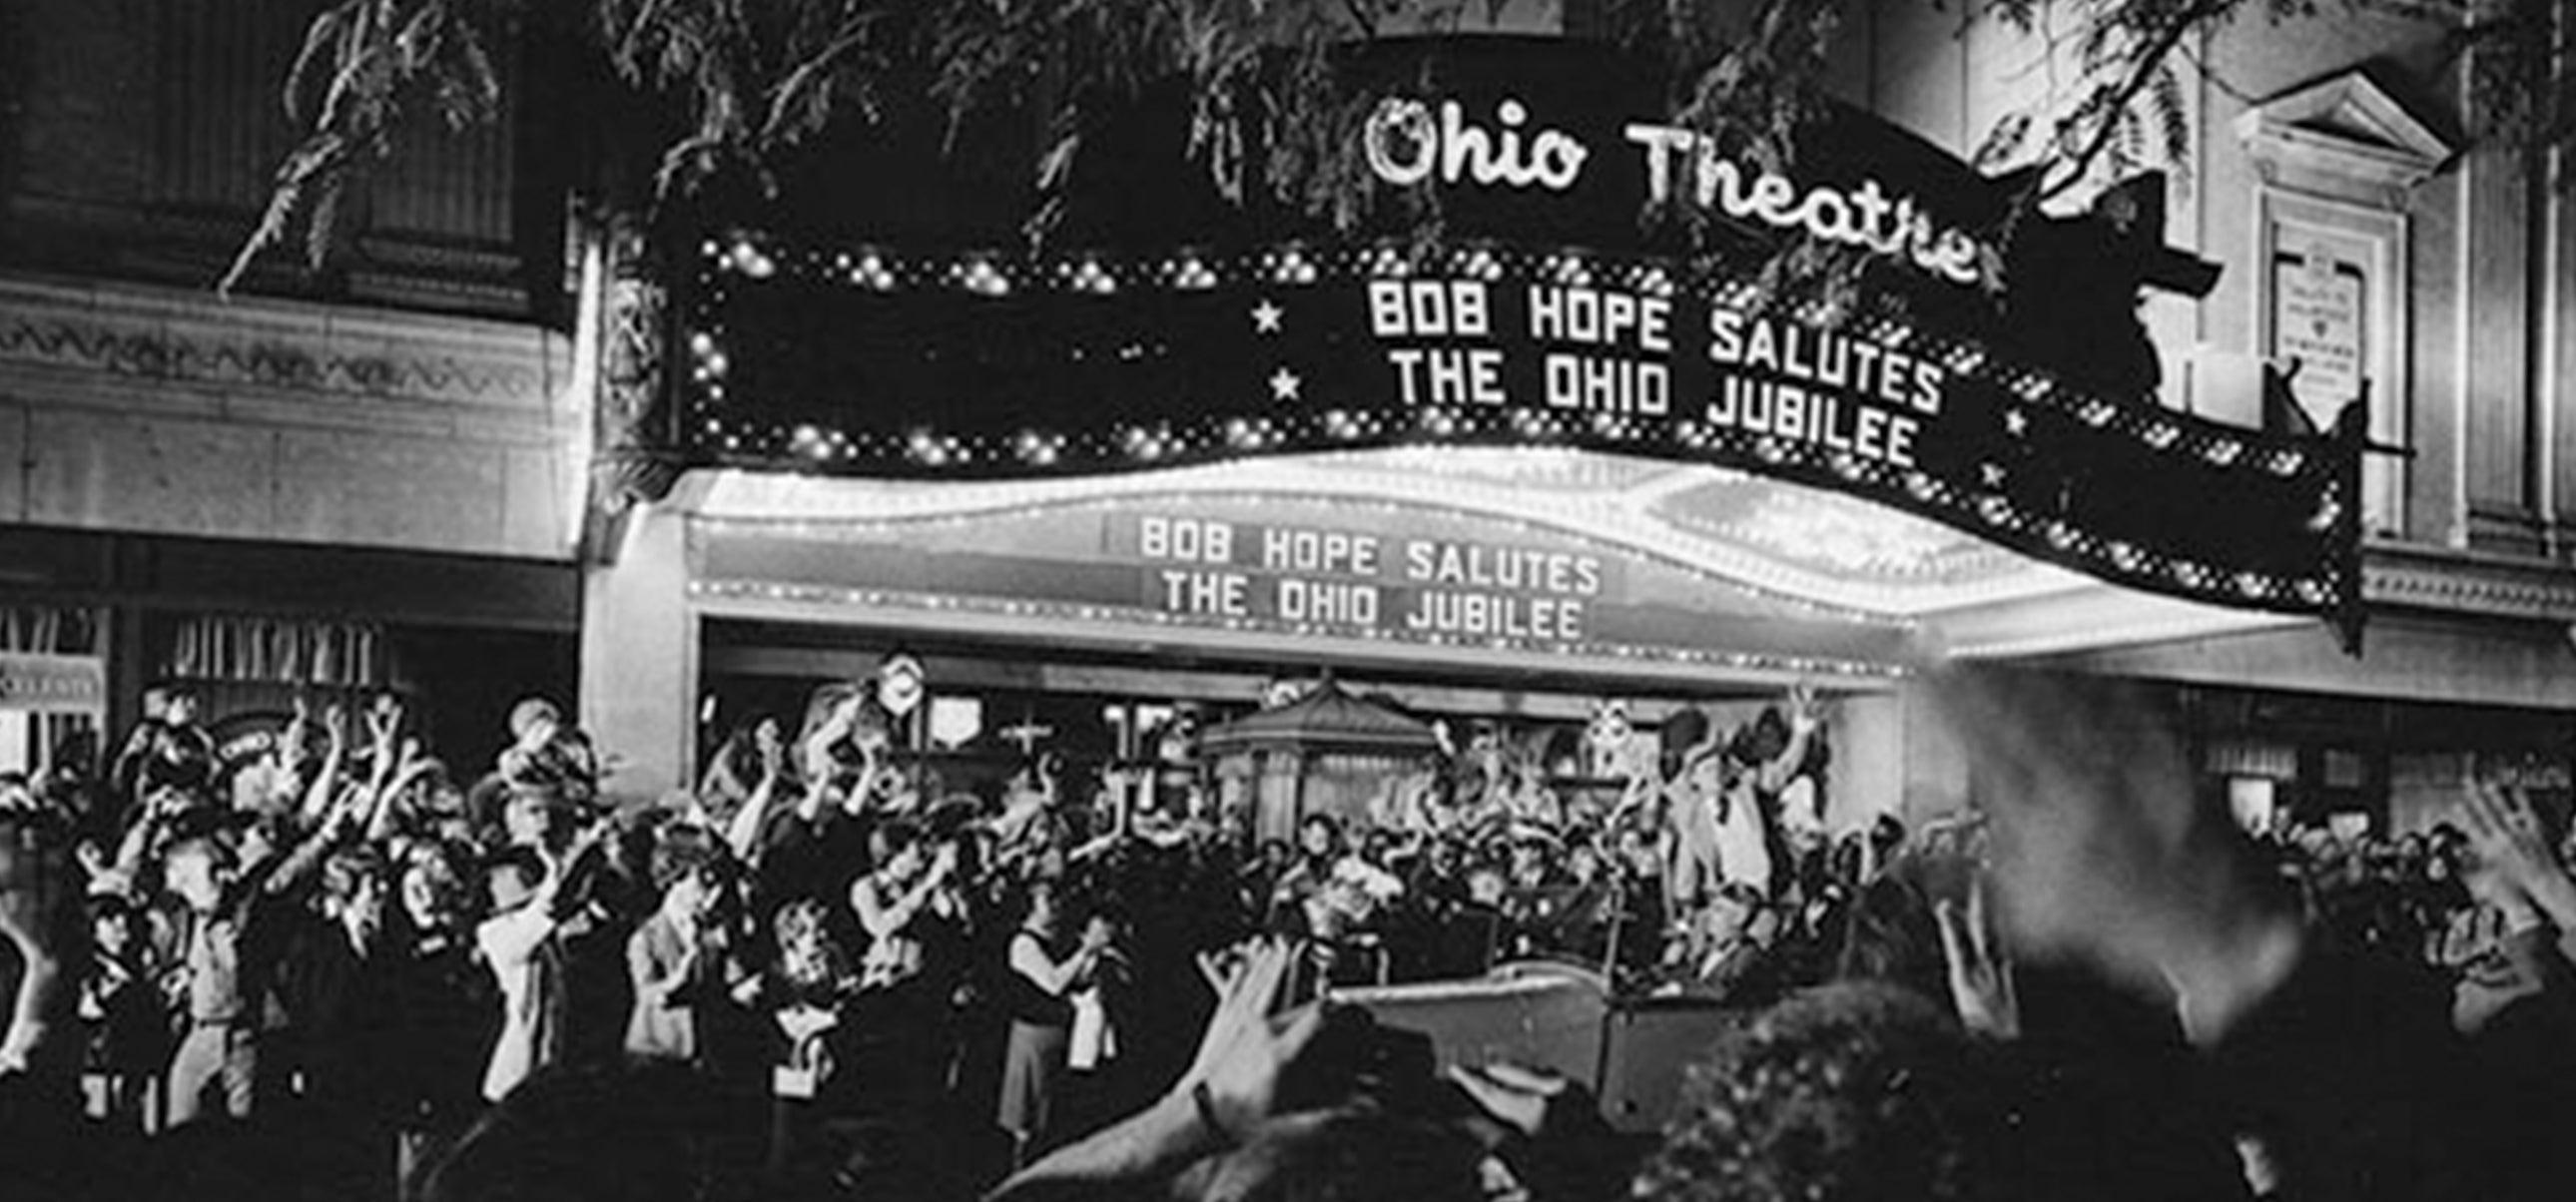 Ohio Theatre birthday Blog HEADER.jpg